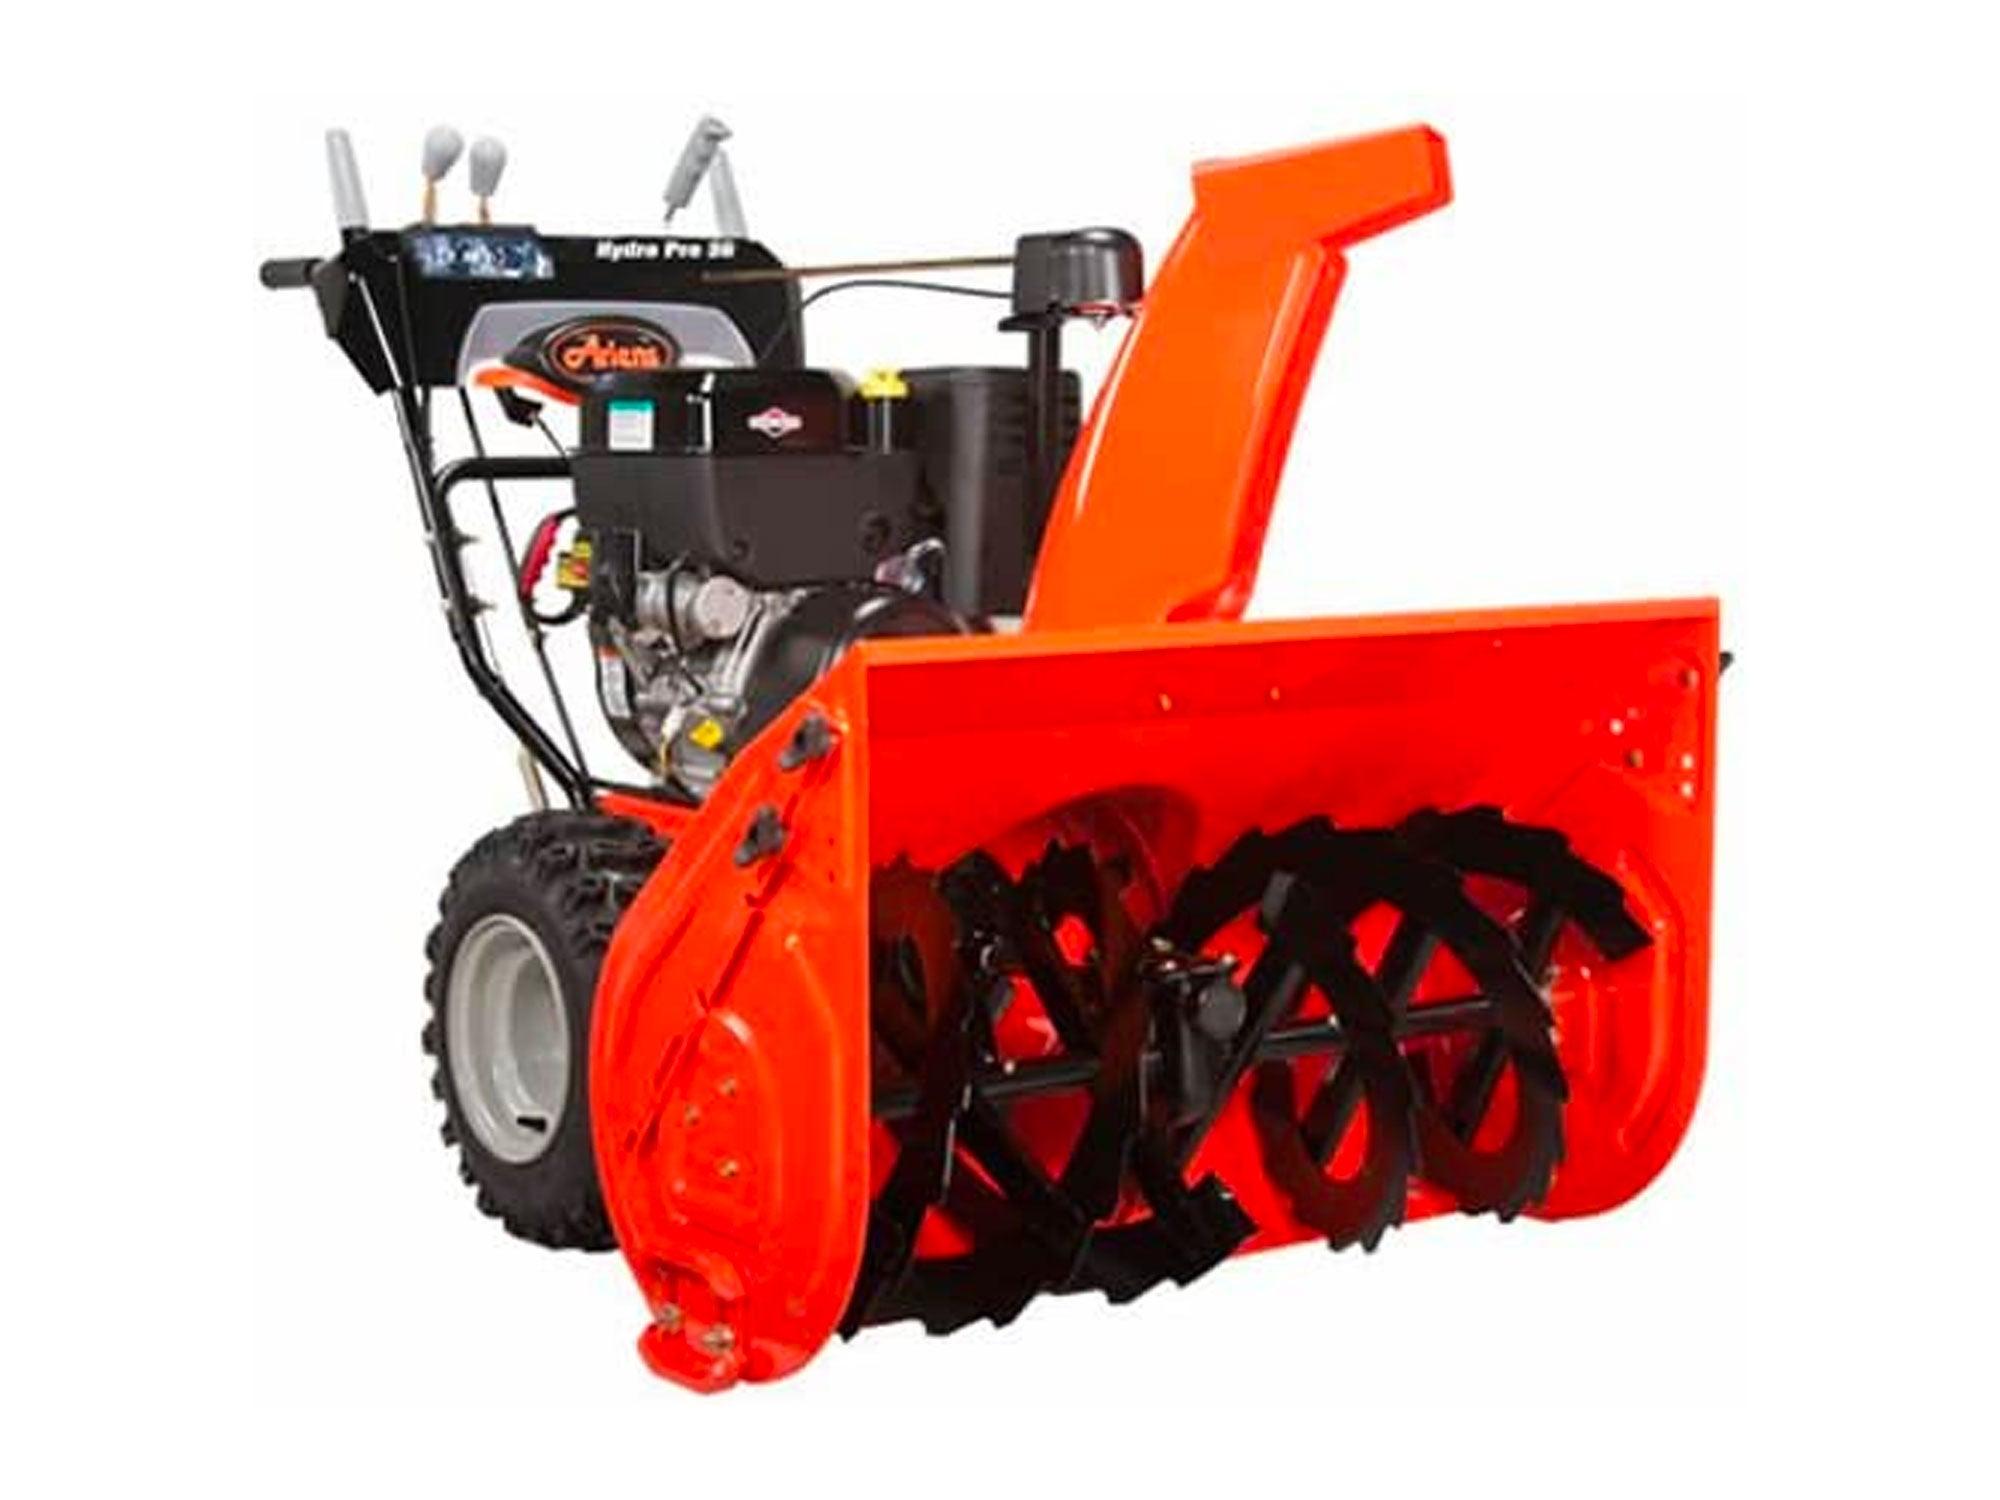 Ariens Professional Hydro 36